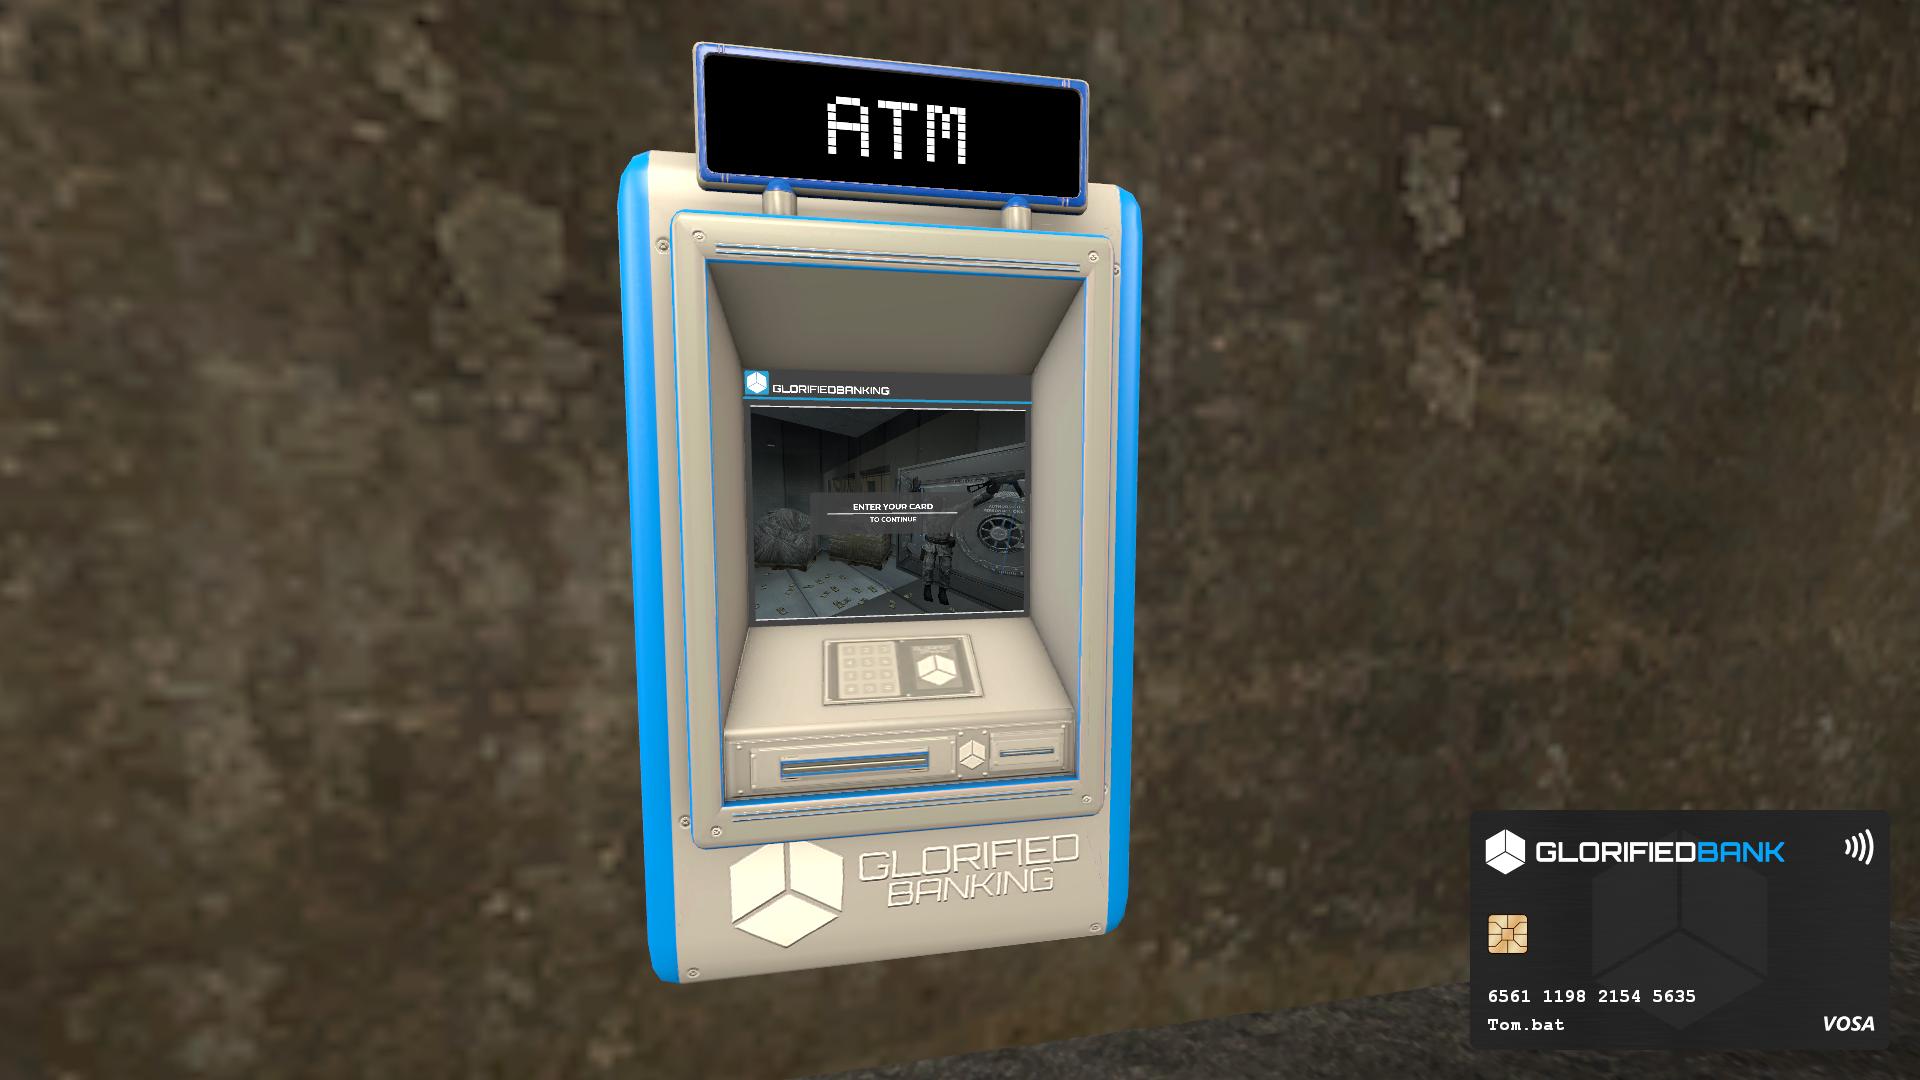 ATM entity preview